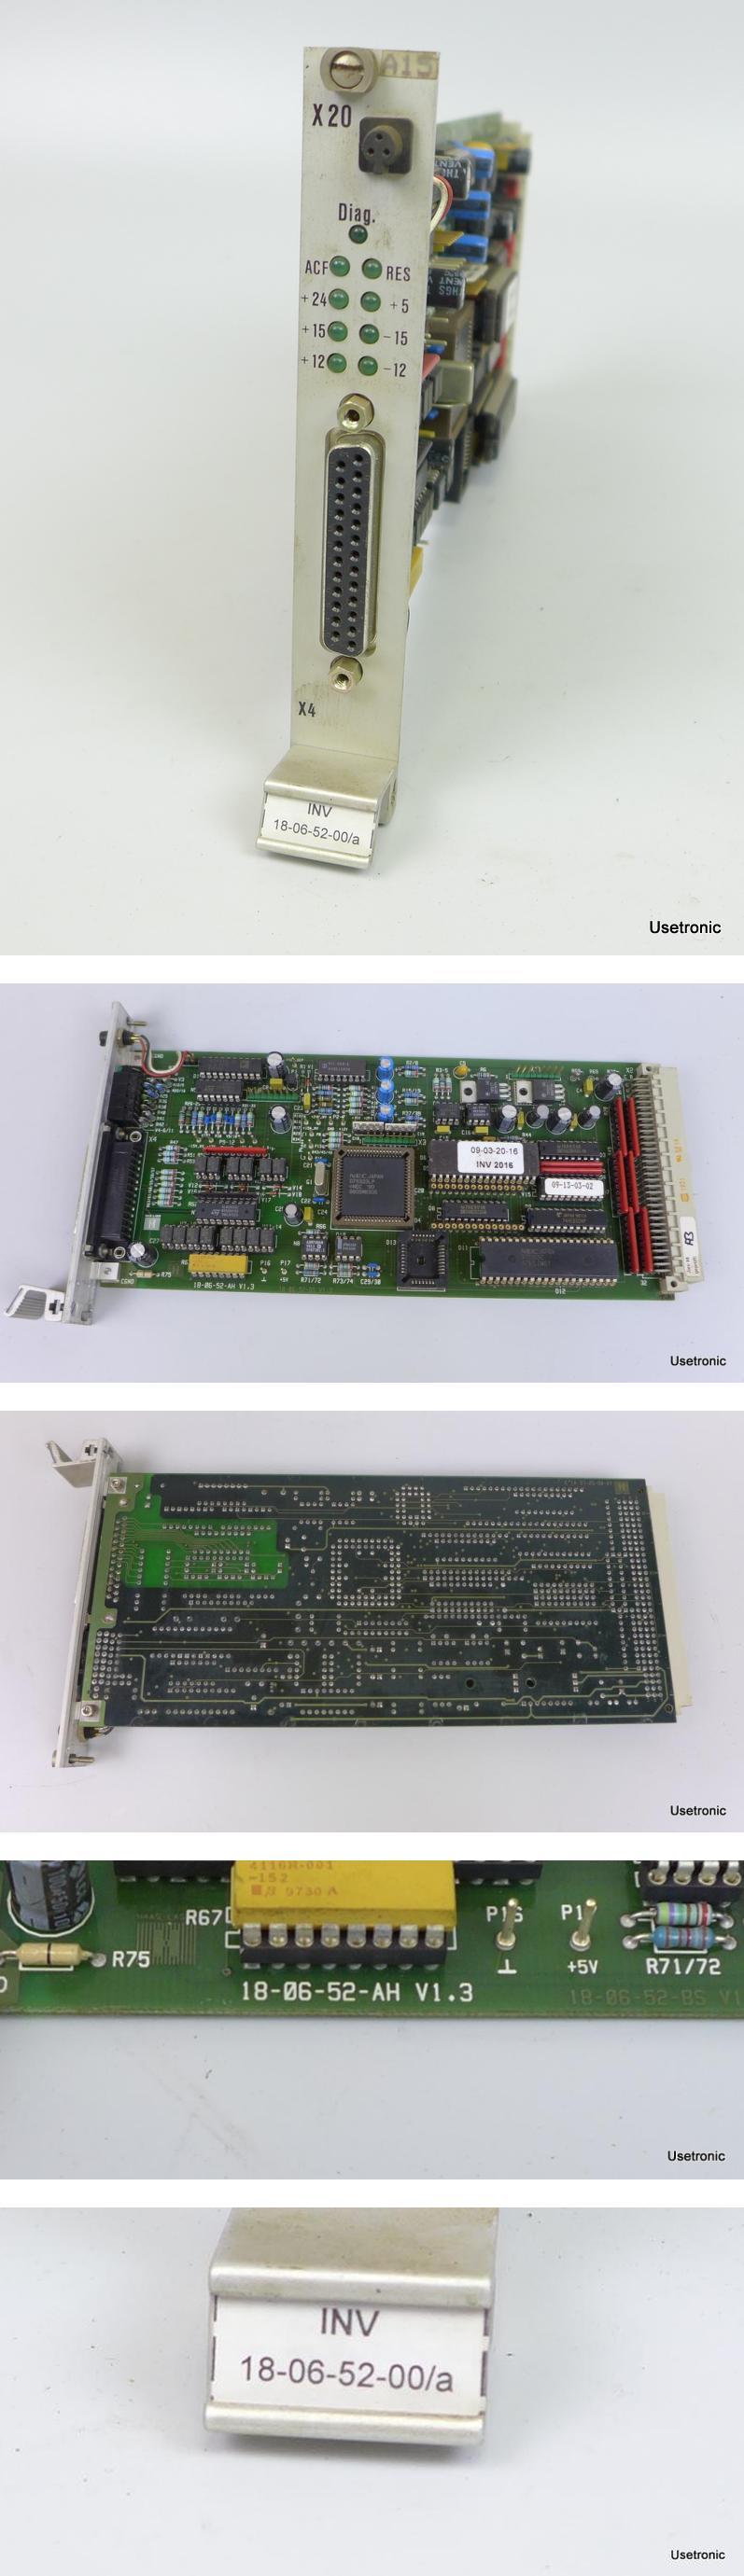 Haas Laser INV 18-06-52